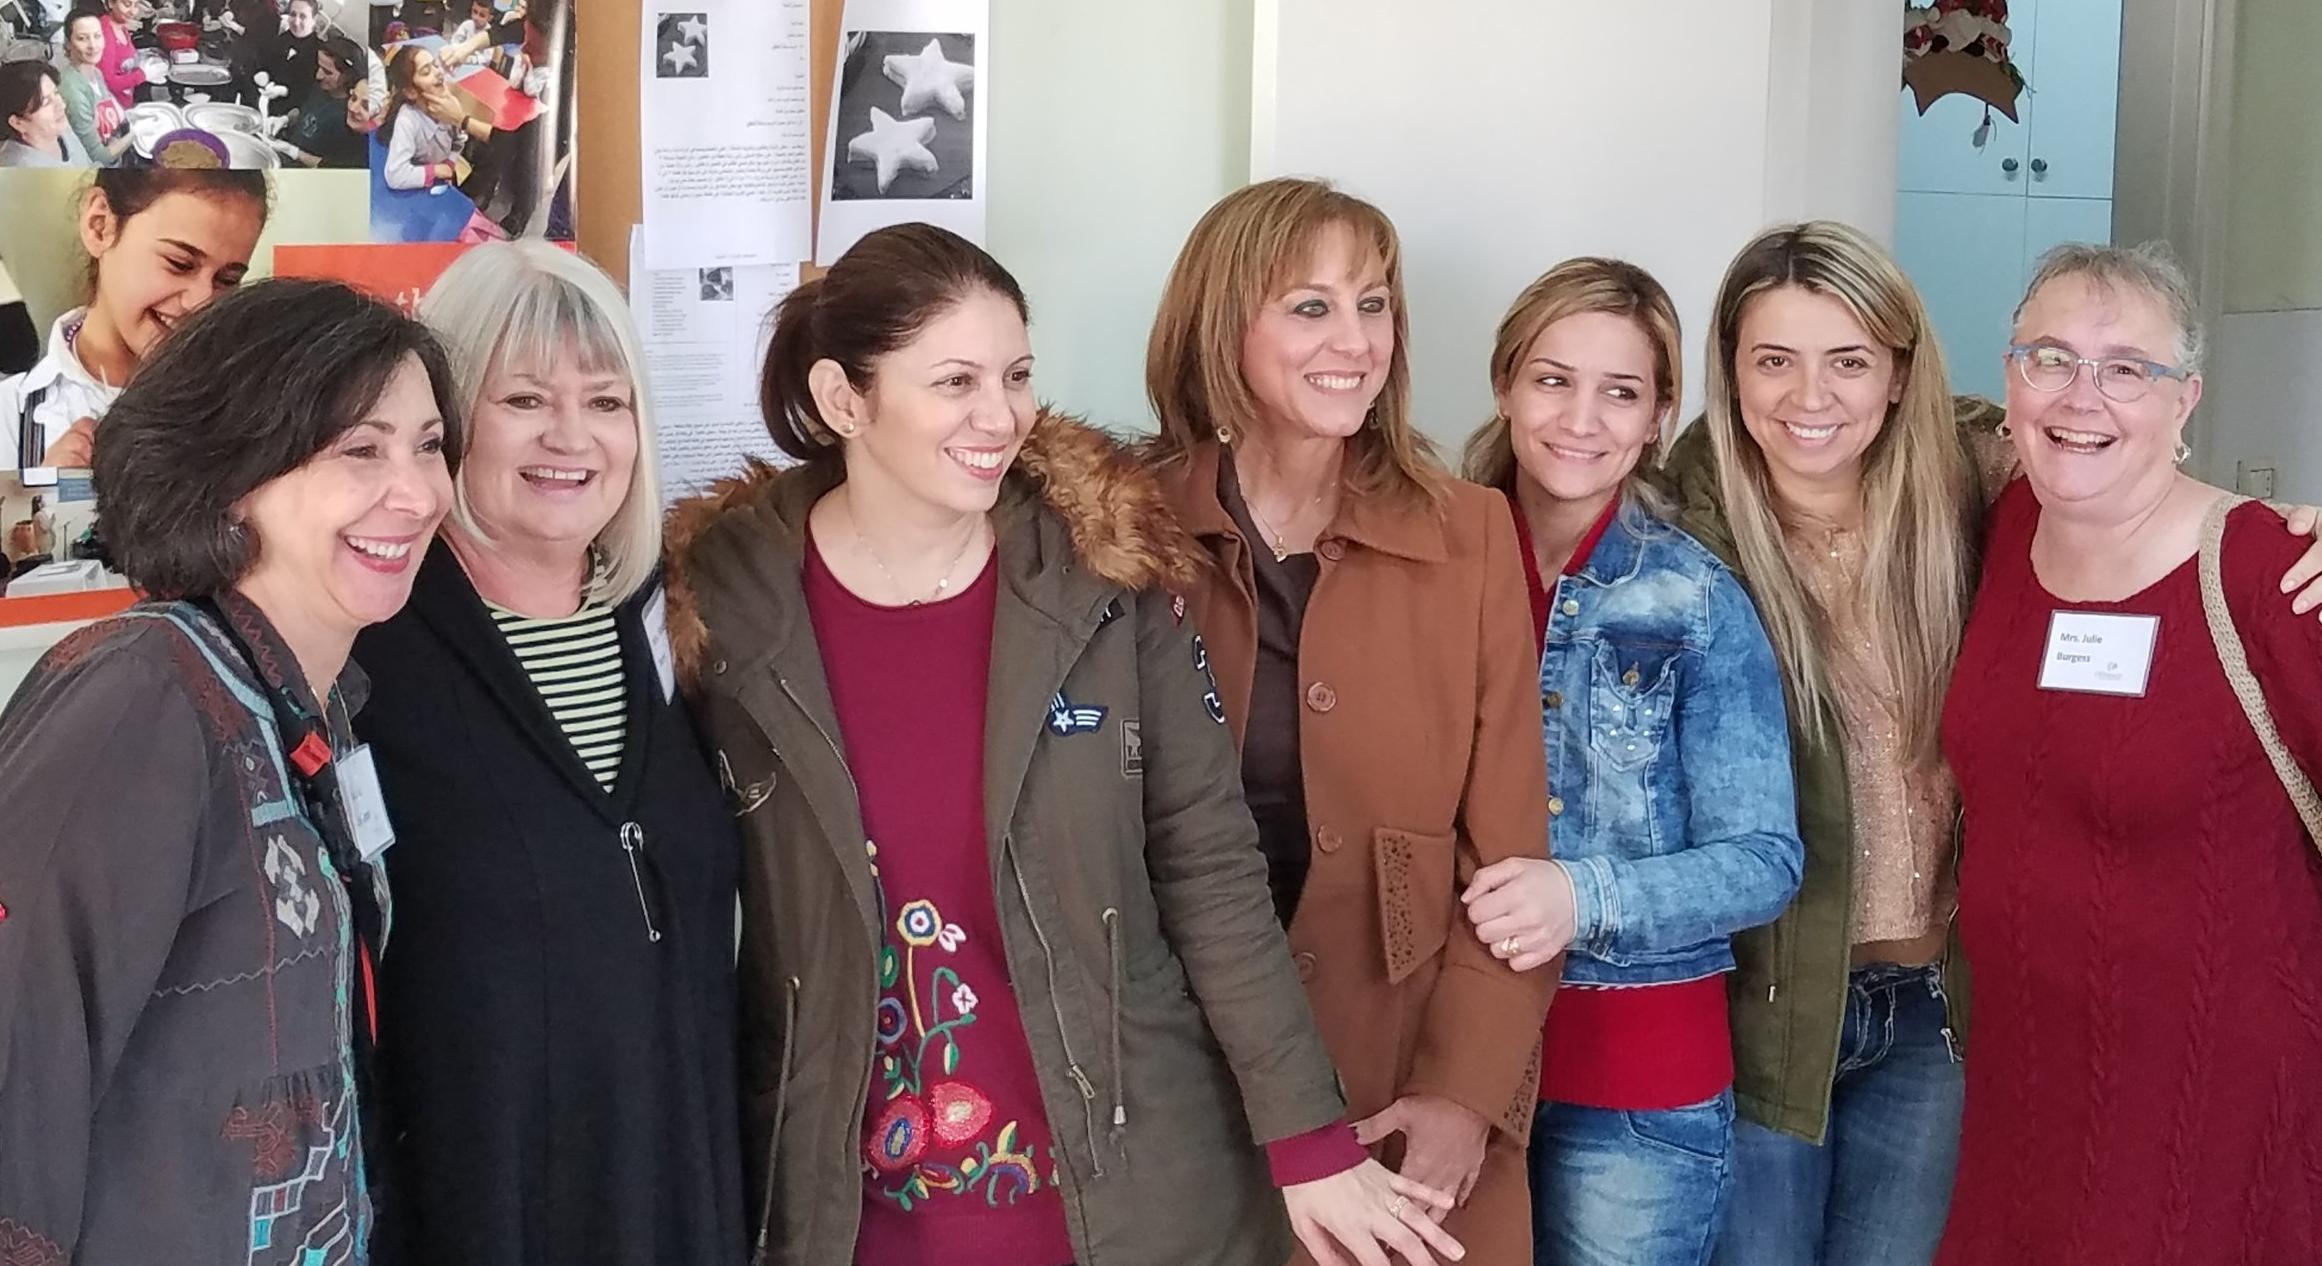 Lisa, Marilyn, Grace, Vivienne, Reem, Rola, and Julie